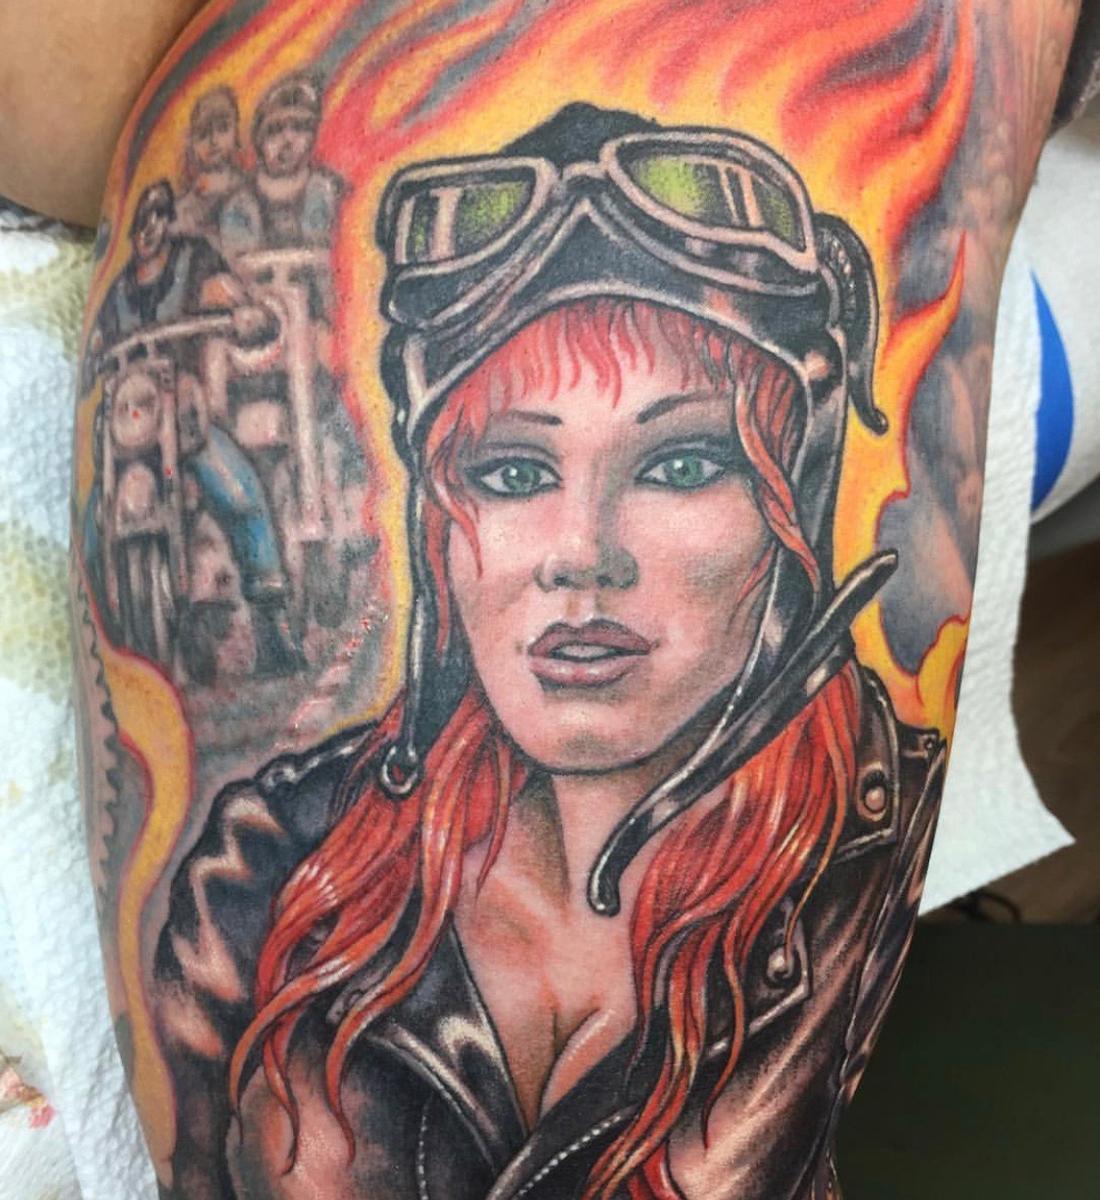 Reinventing the Tattoo - Multi-layered Tattoos